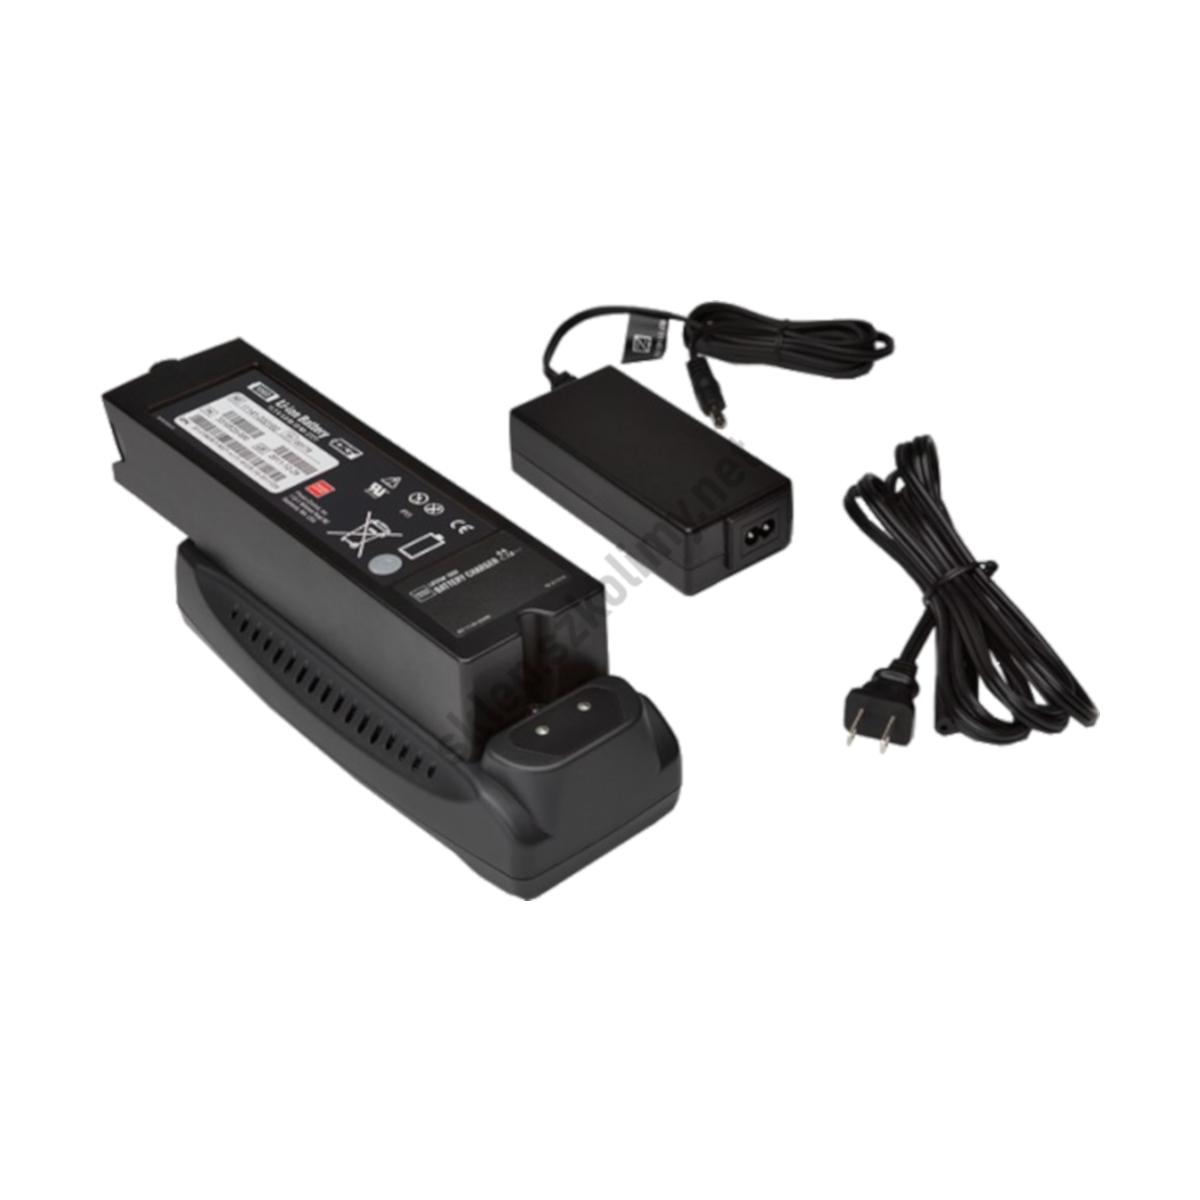 Ładowarka do baterii defibrylatora AED LIFEPAK 1000